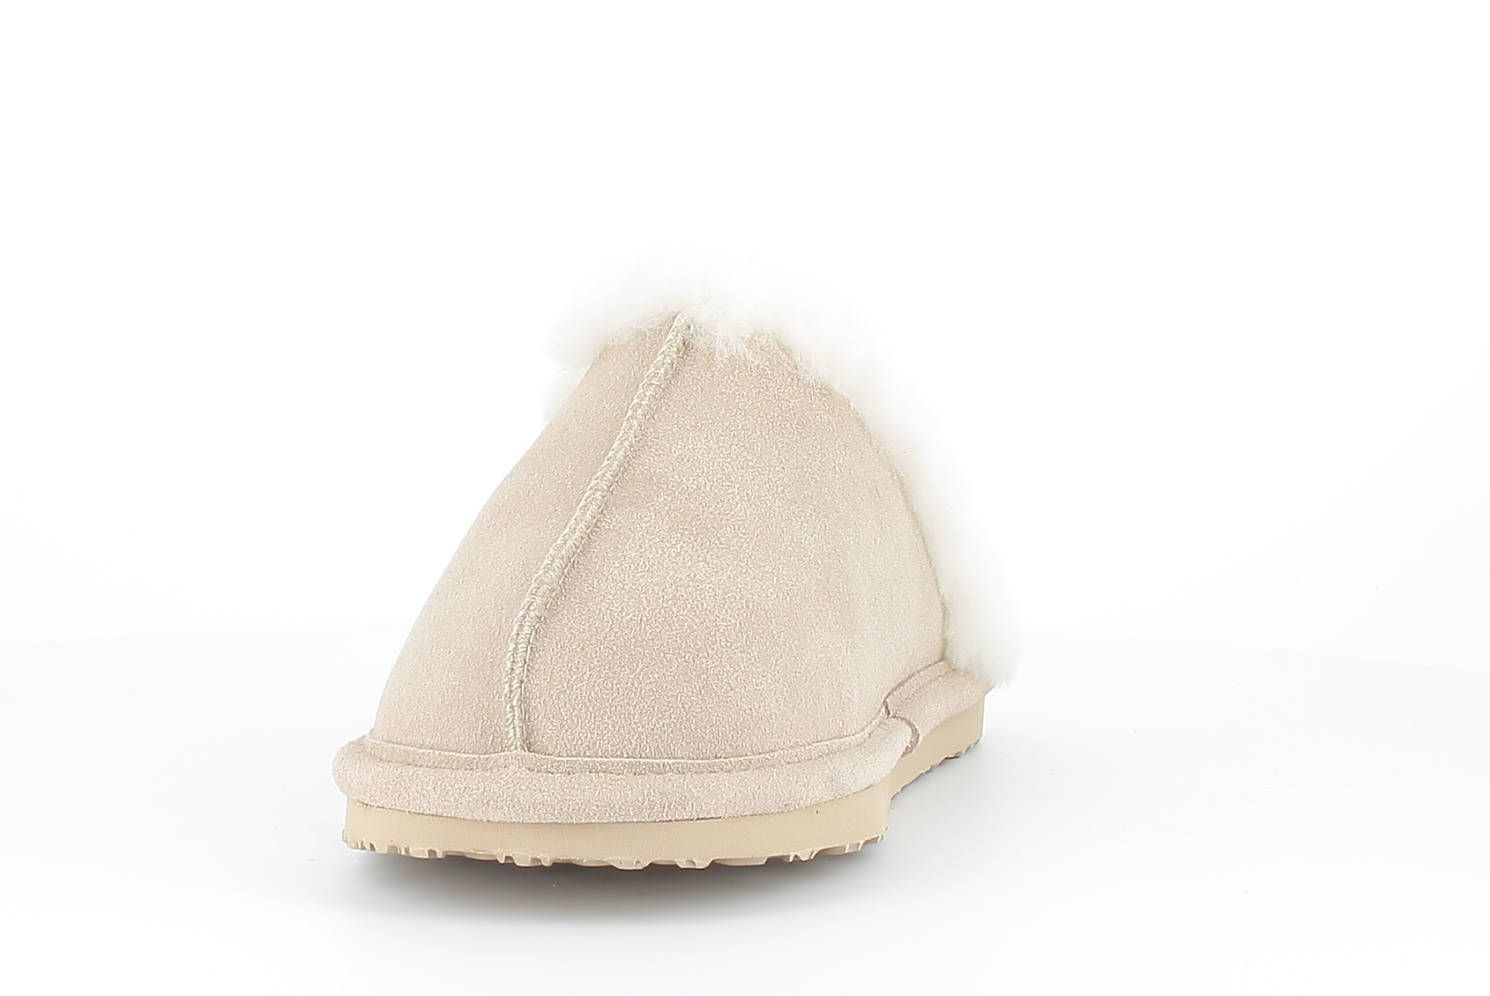 Sheepskin Torino Mule Slippers in Sand with Fur Trim